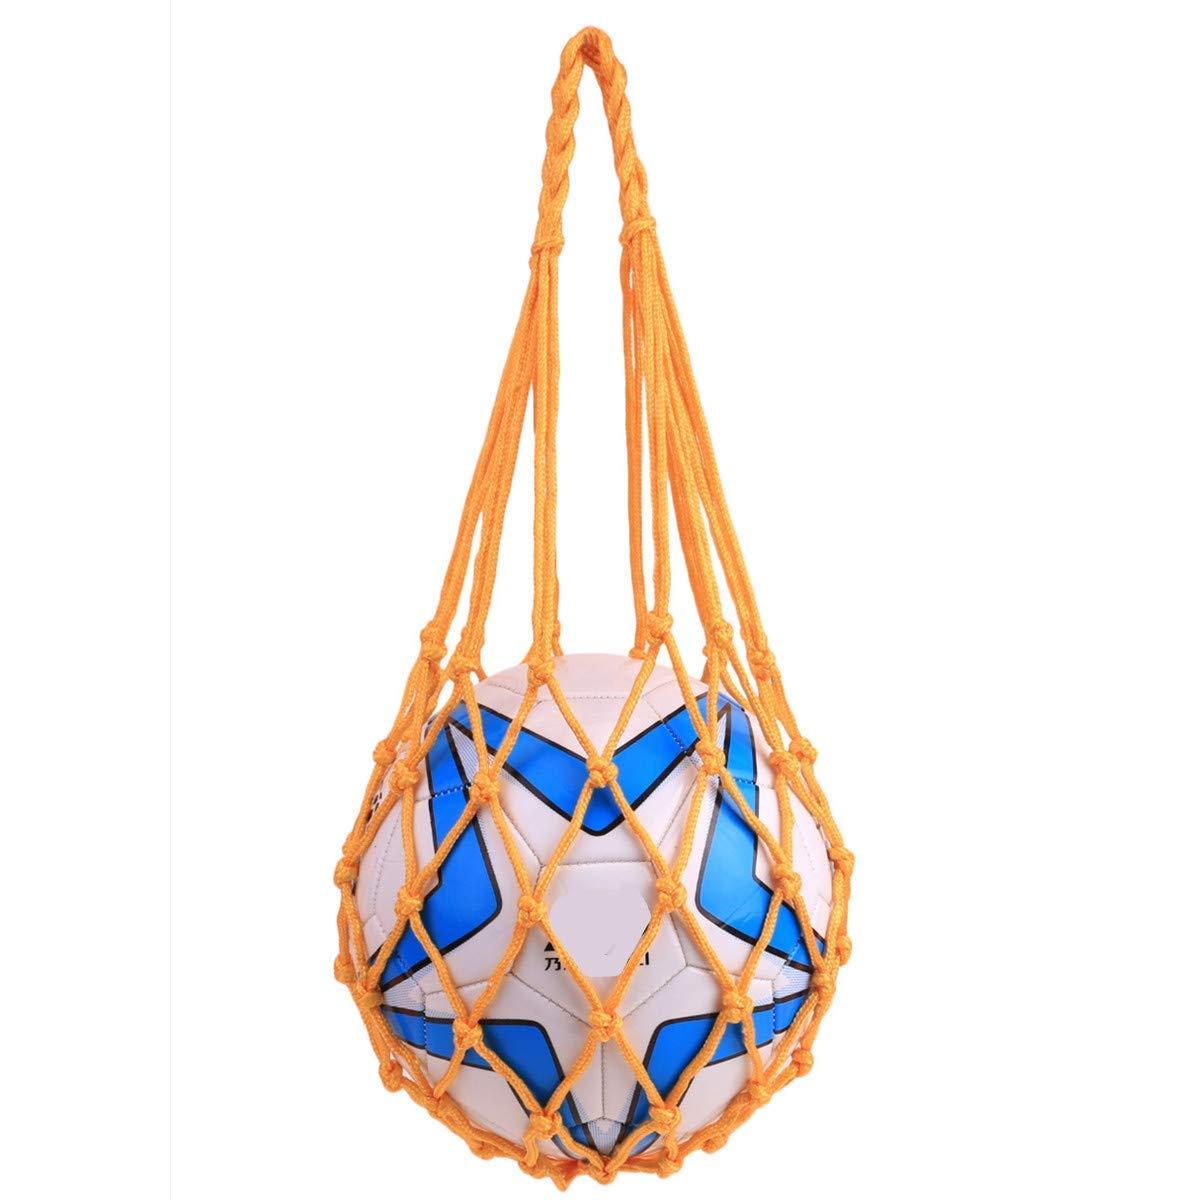 HNJZX Personal Basketball Carry Net Mesh Bag tennis volleyball basketball soccer net pocket with bold handle